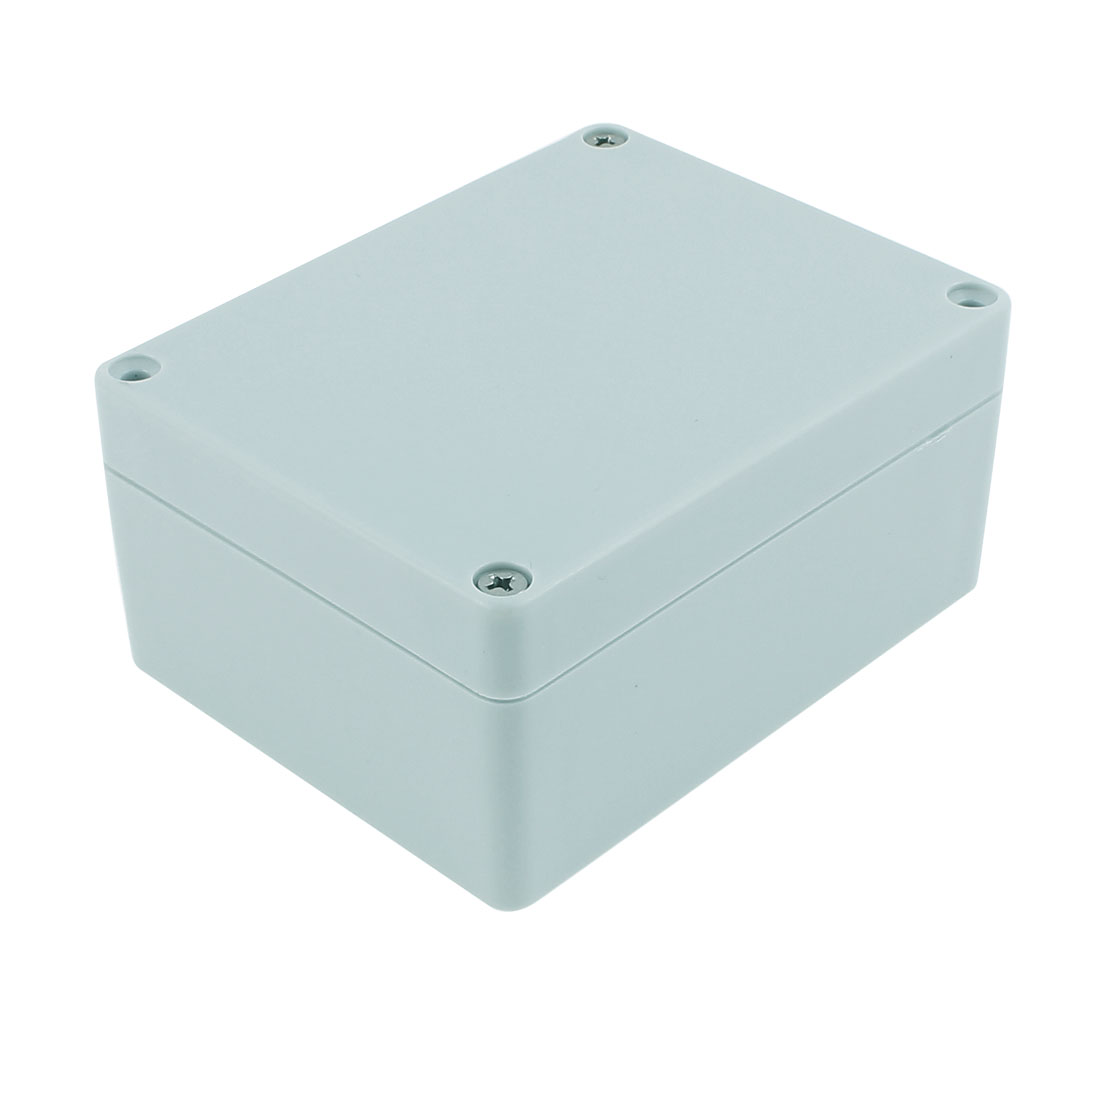 115 x 90 x 55mm Dustproof IP65 Junction Box Terminal Connecting Box Enclosure